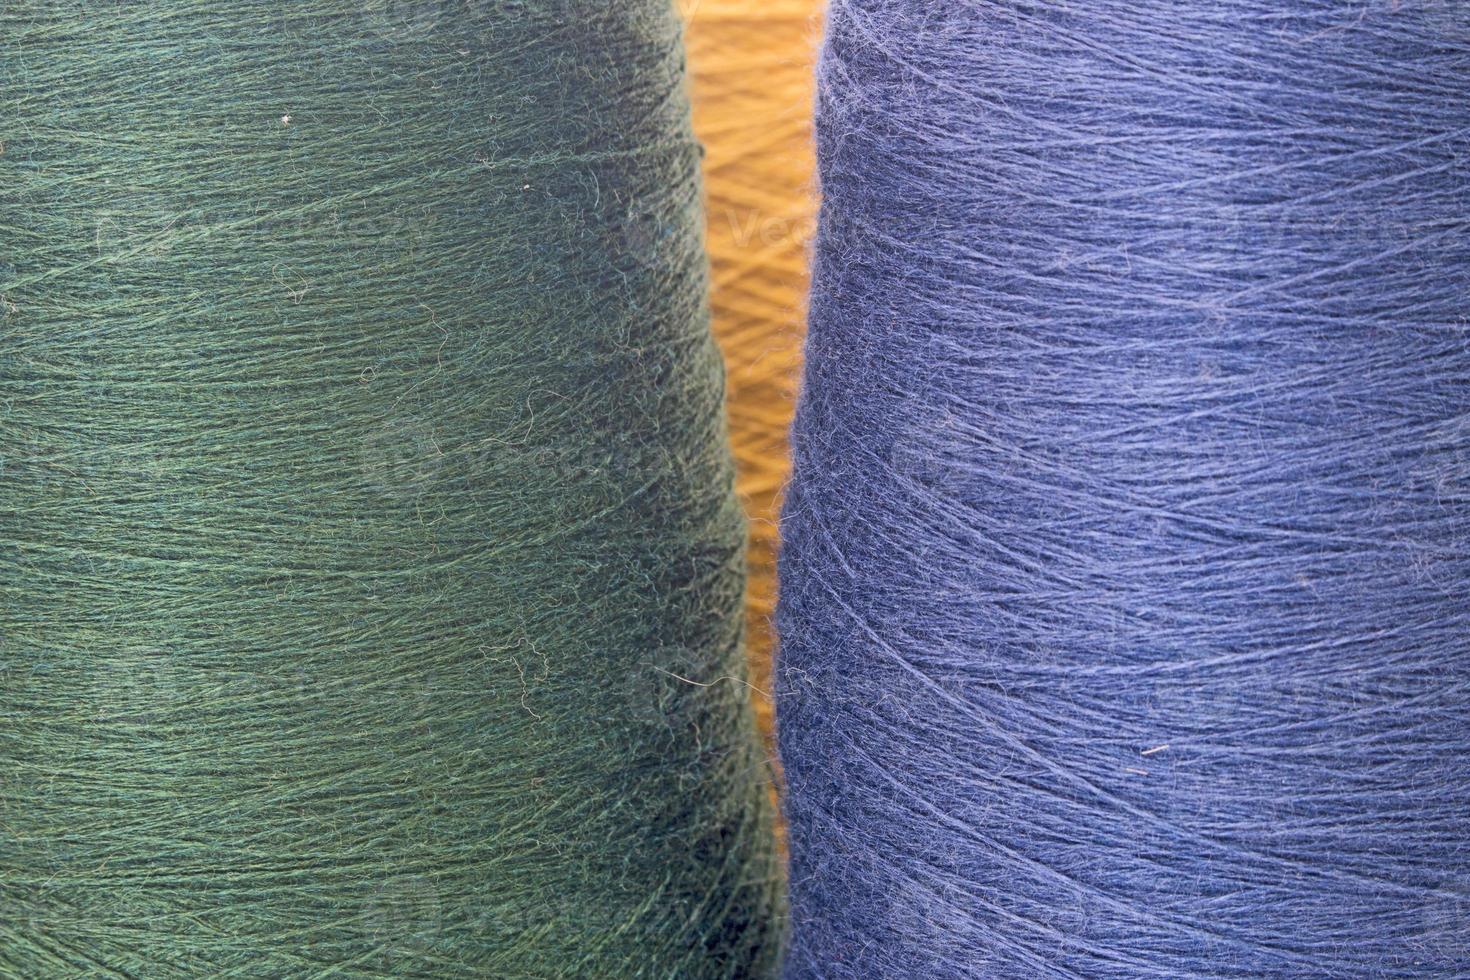 fondo verde y azul de hilos e hilados foto